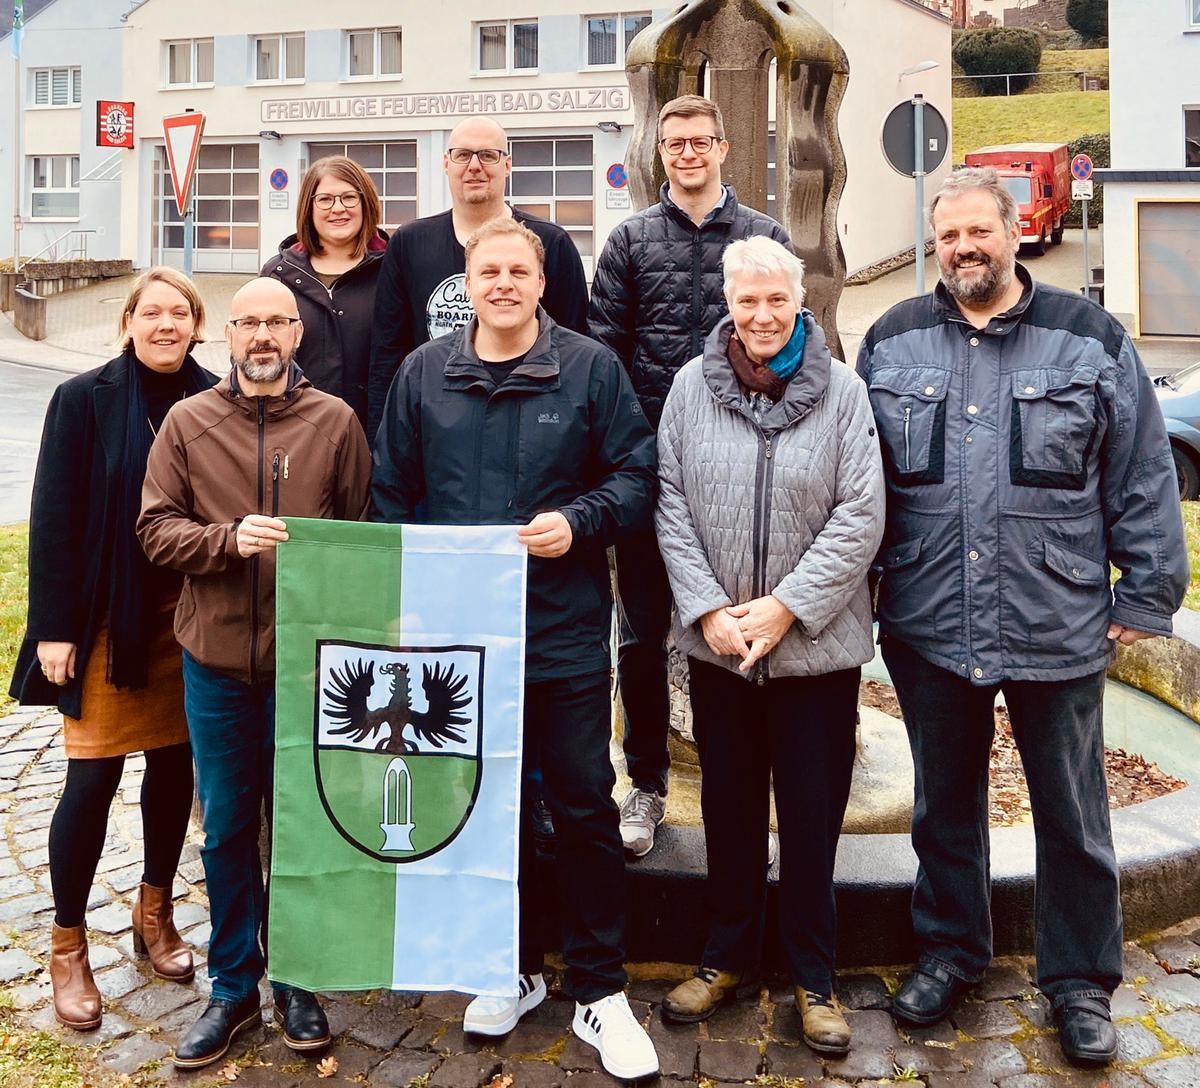 Neue Vorstandsmannschaft für den VVV Bad Salzig e.V.